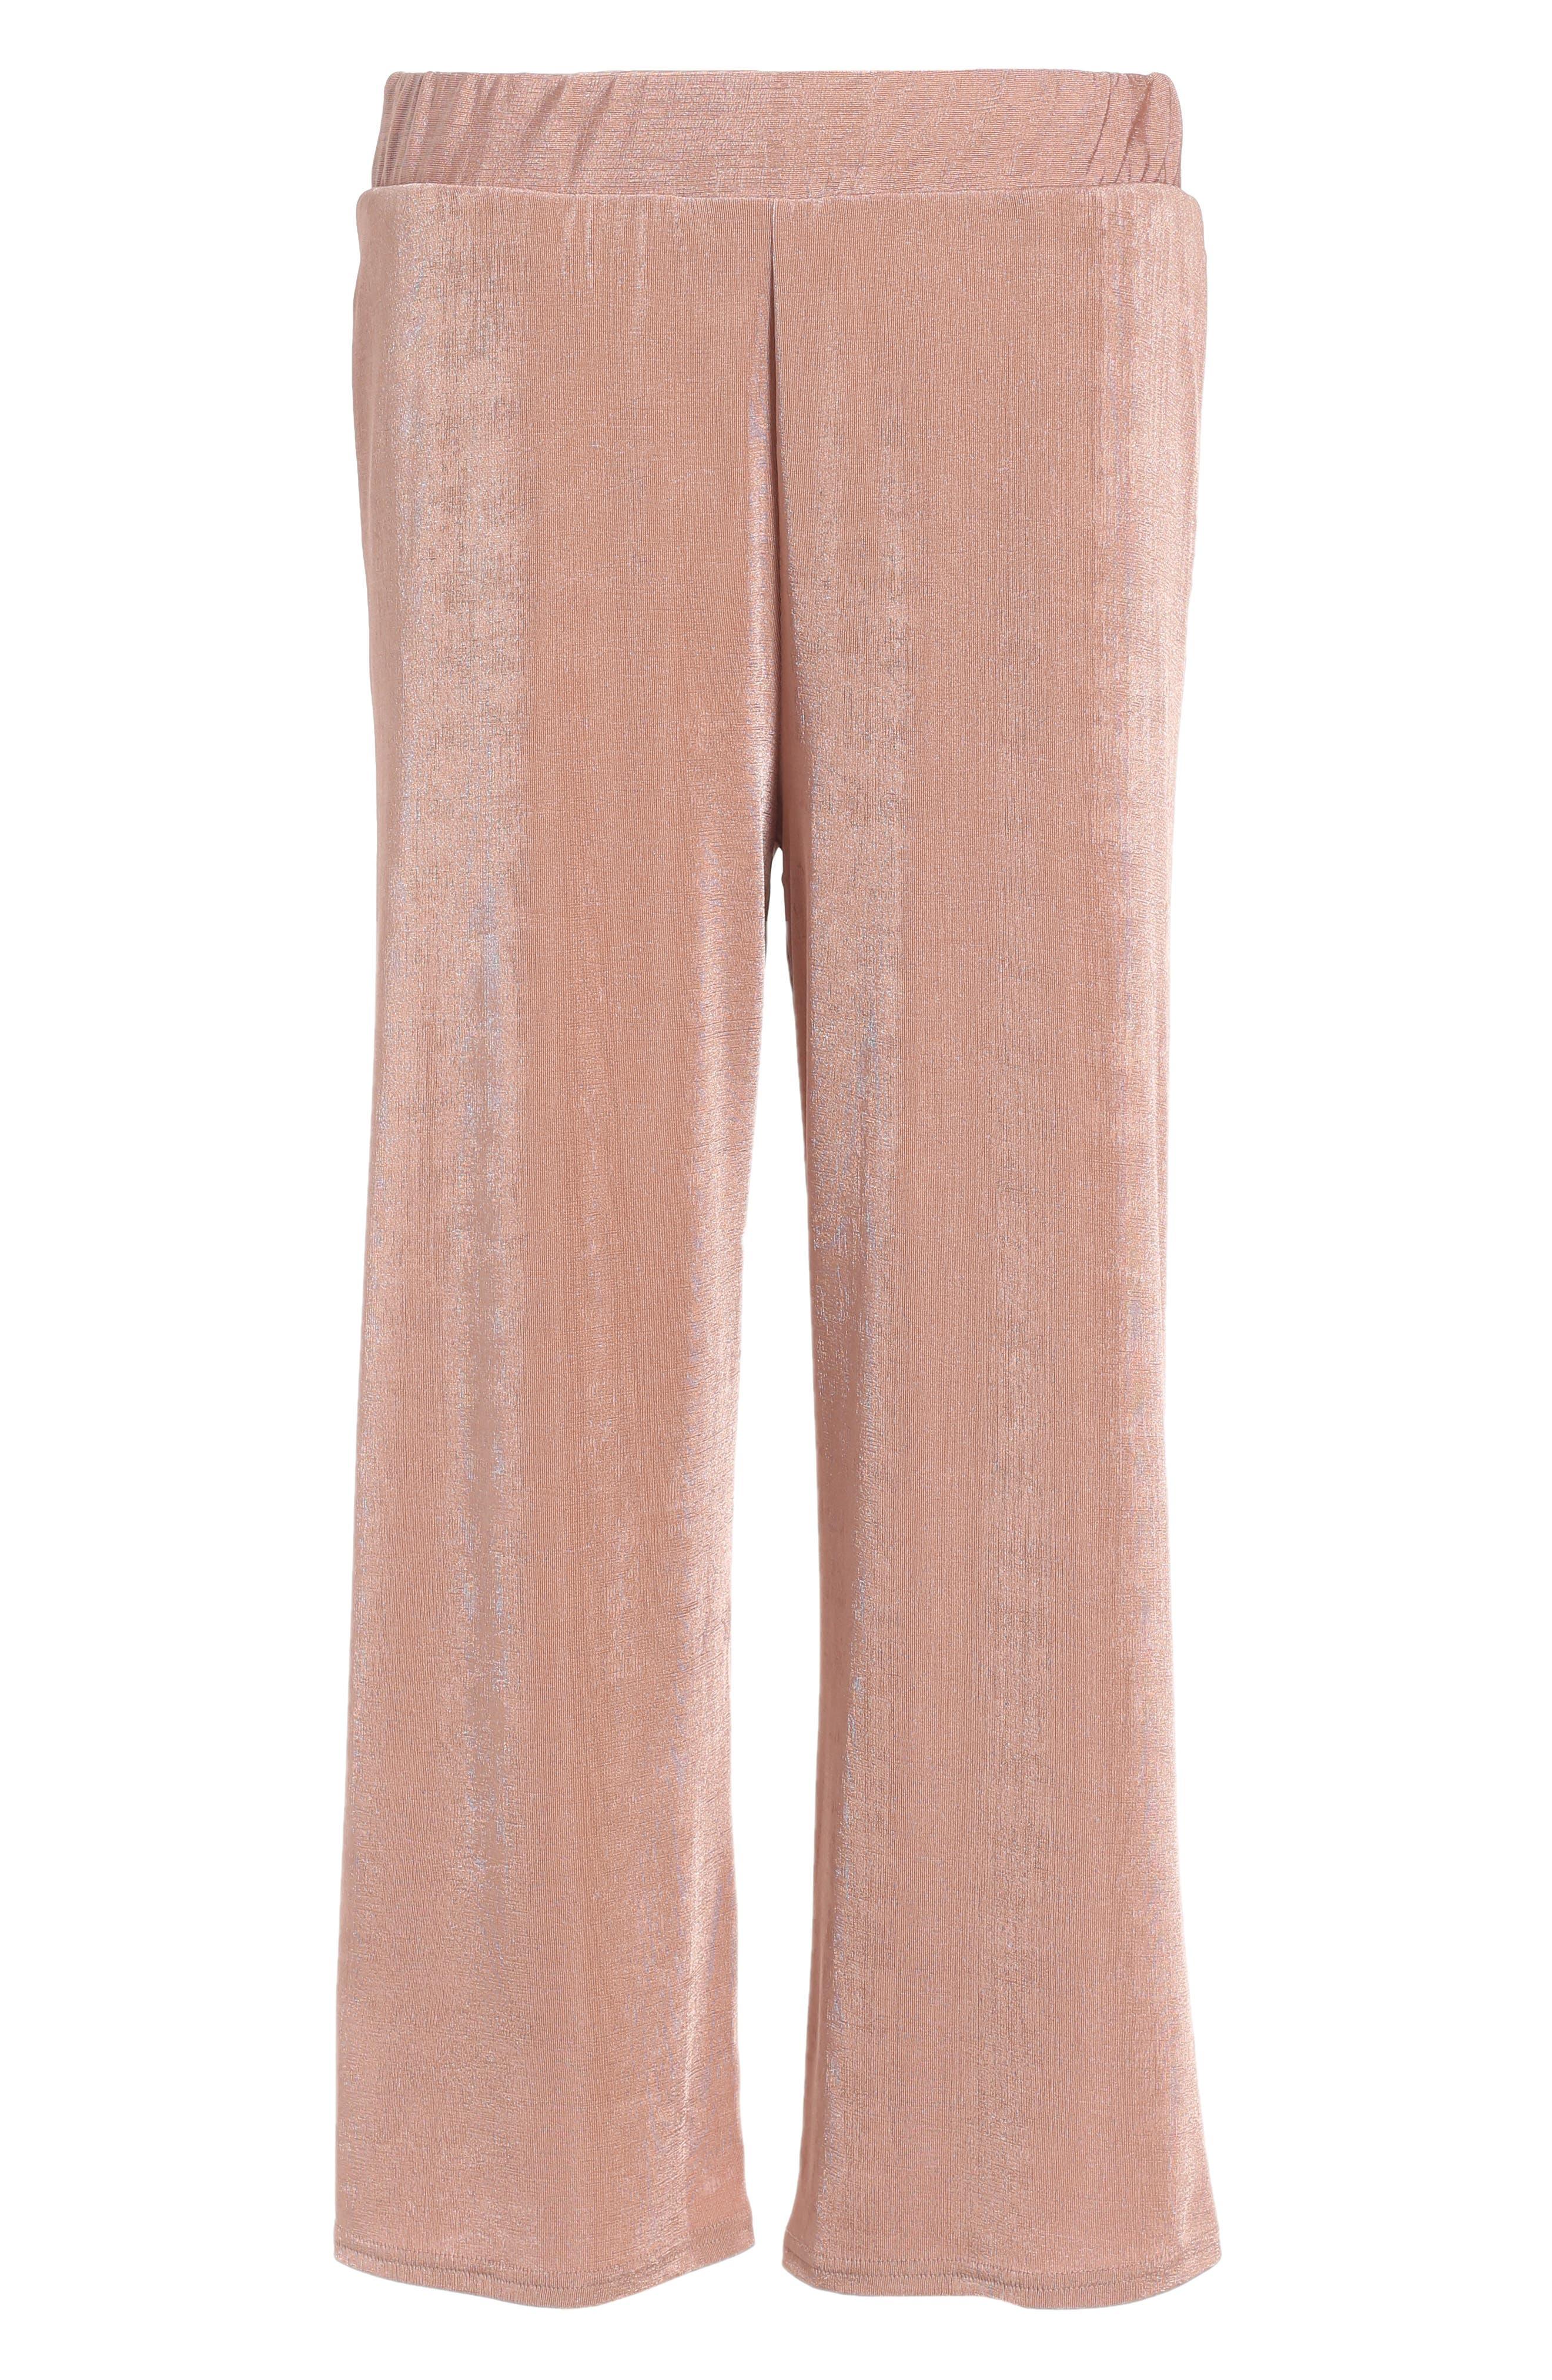 Topshop Textured Wide Leg Pants